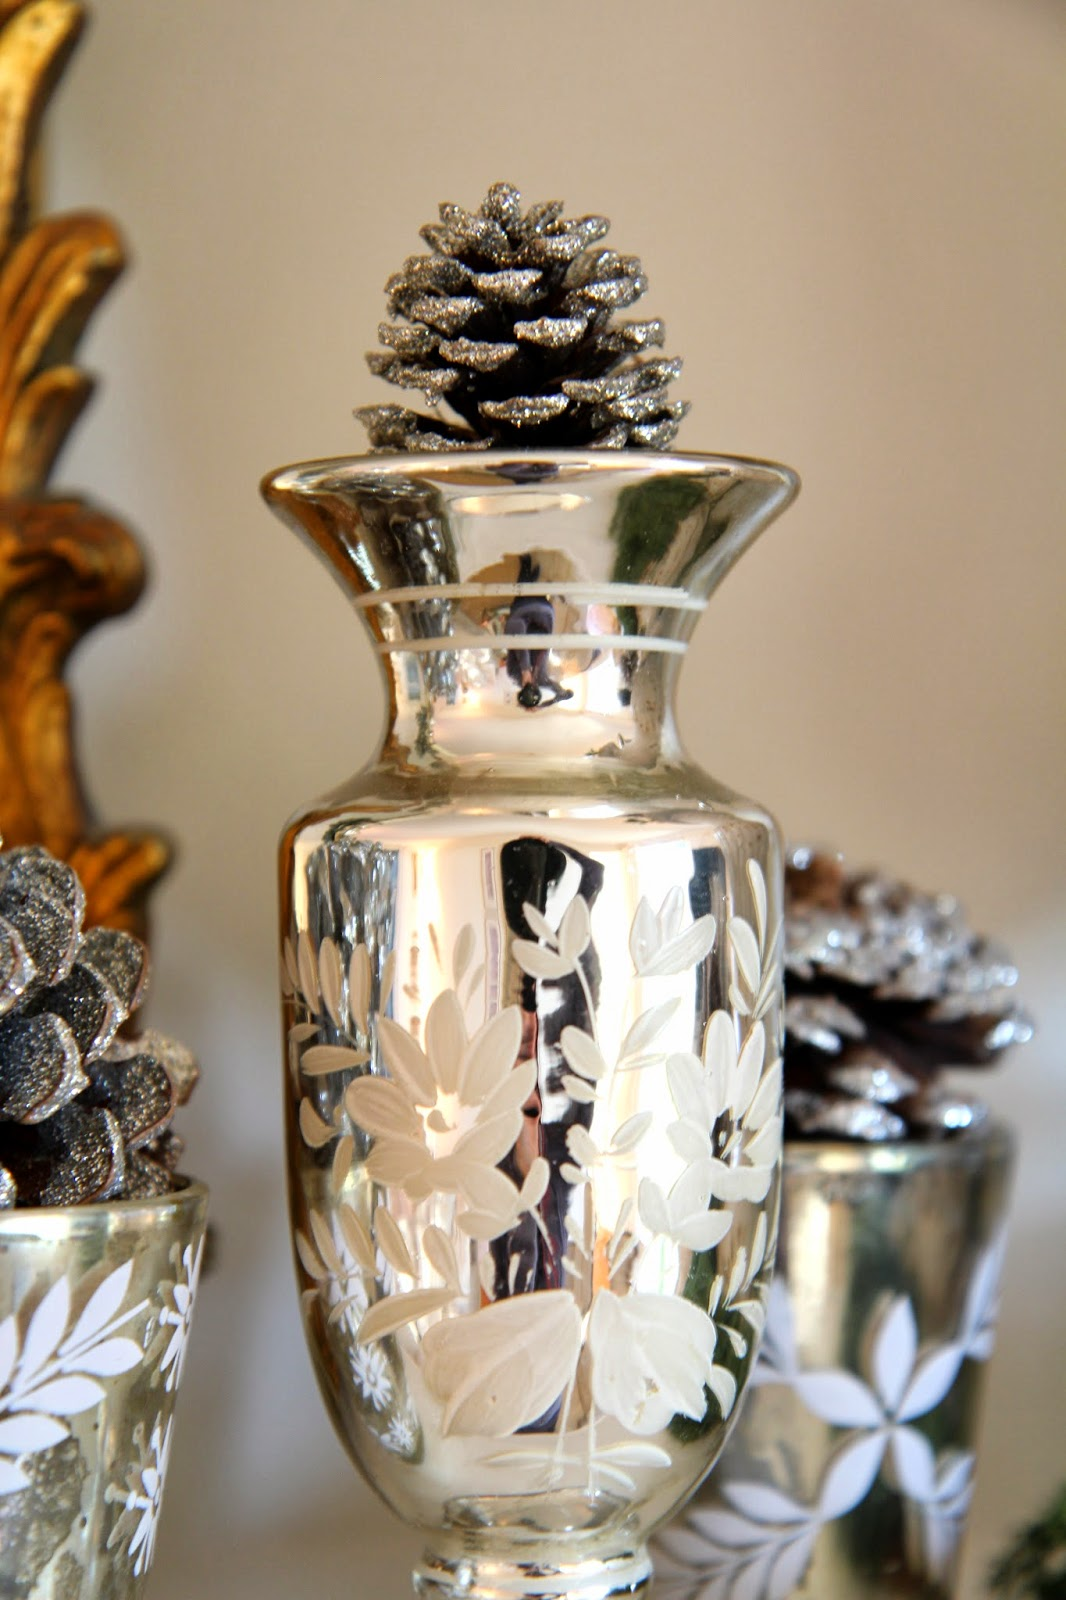 Mercury Glass and Glittered Pinecones